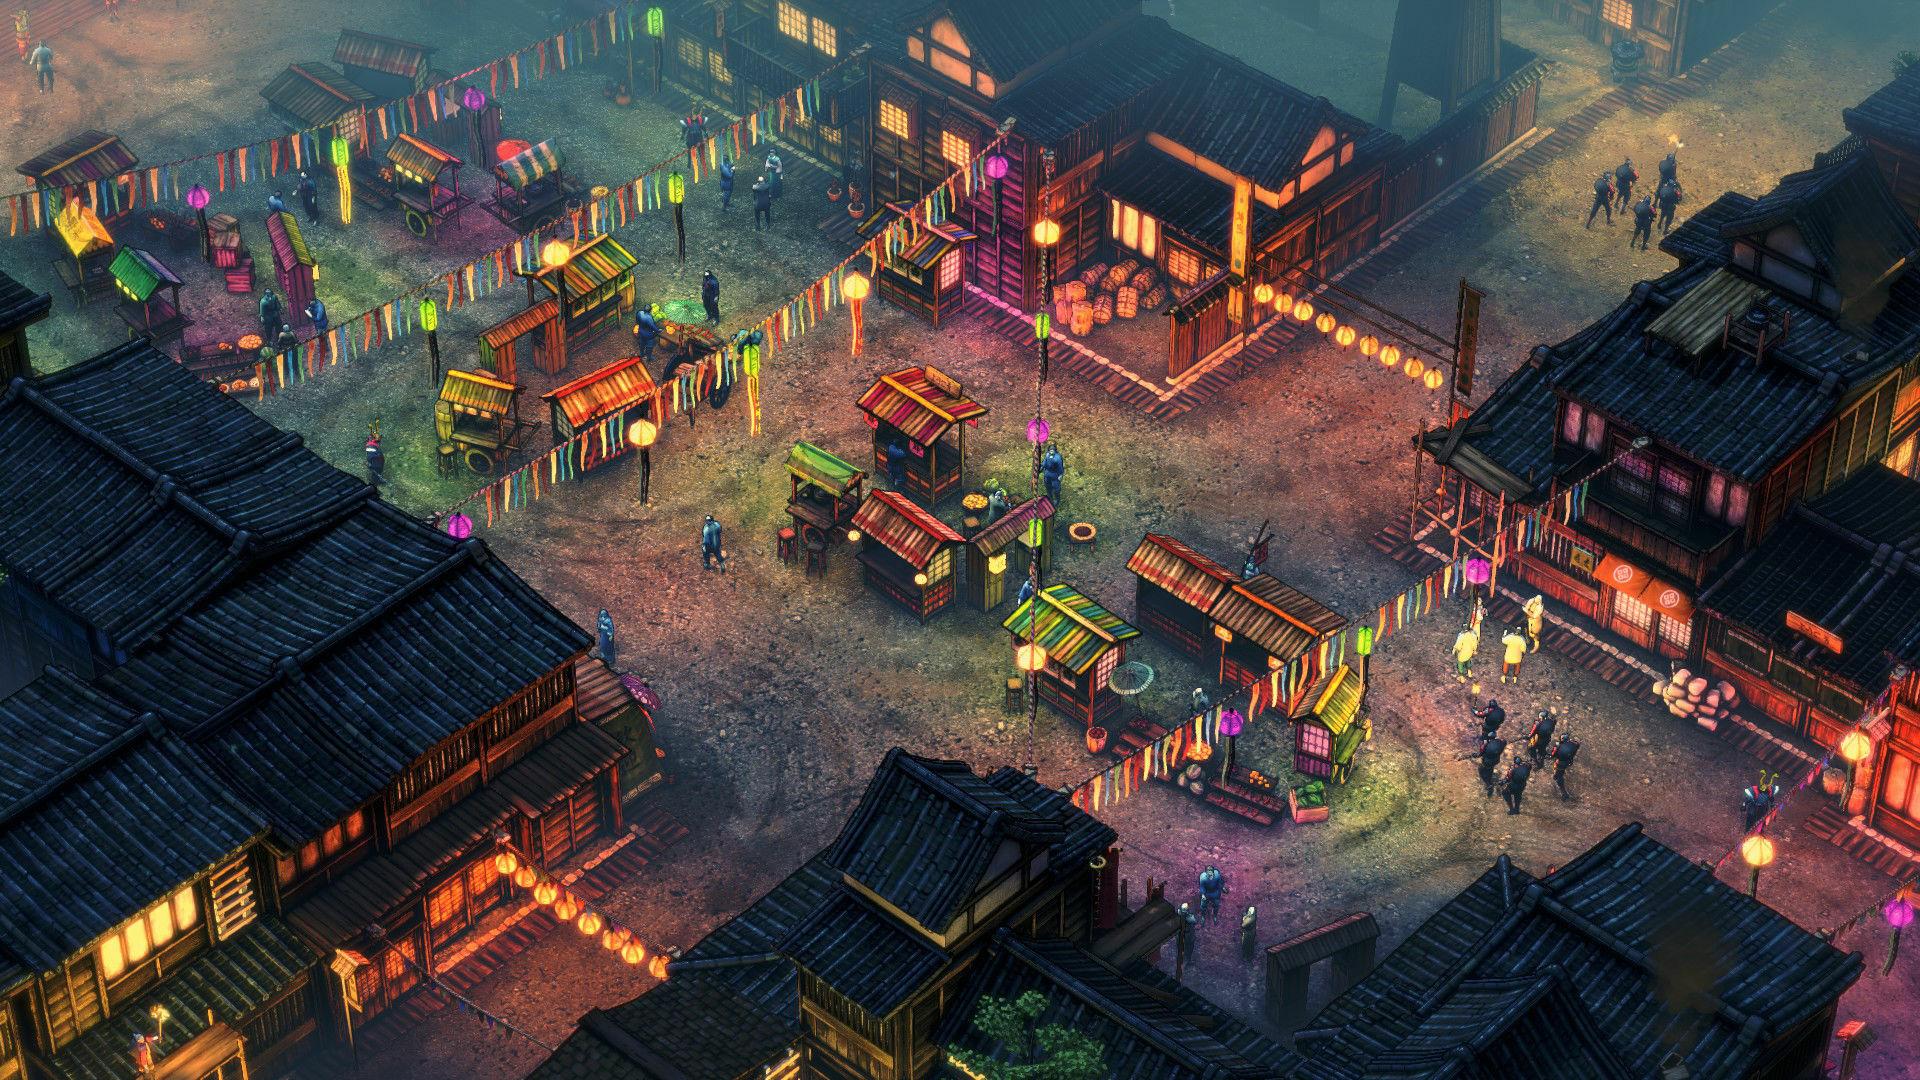 shadow-tactics-blades-of-the-shogun-pc-screenshot-3